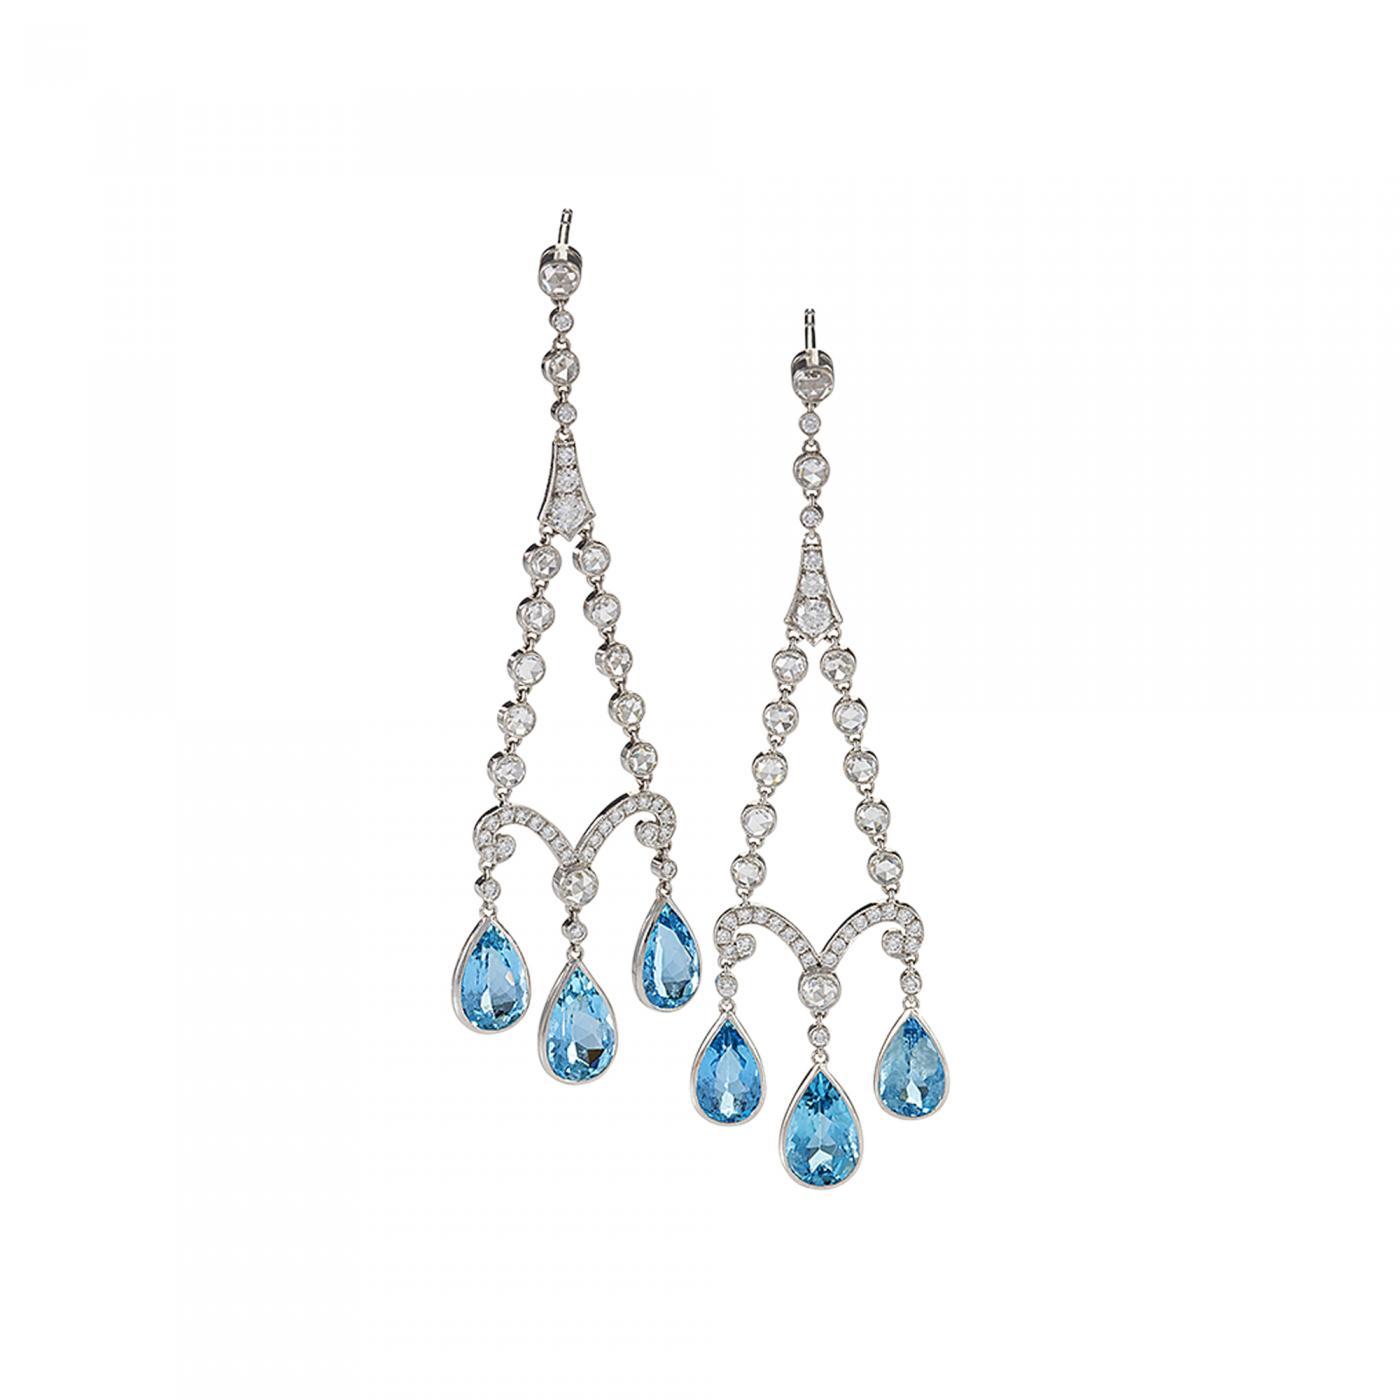 5eb2e1c27 Tiffany and Co. - Tiffany & Co. Earrings with Aquamarine and Diamond